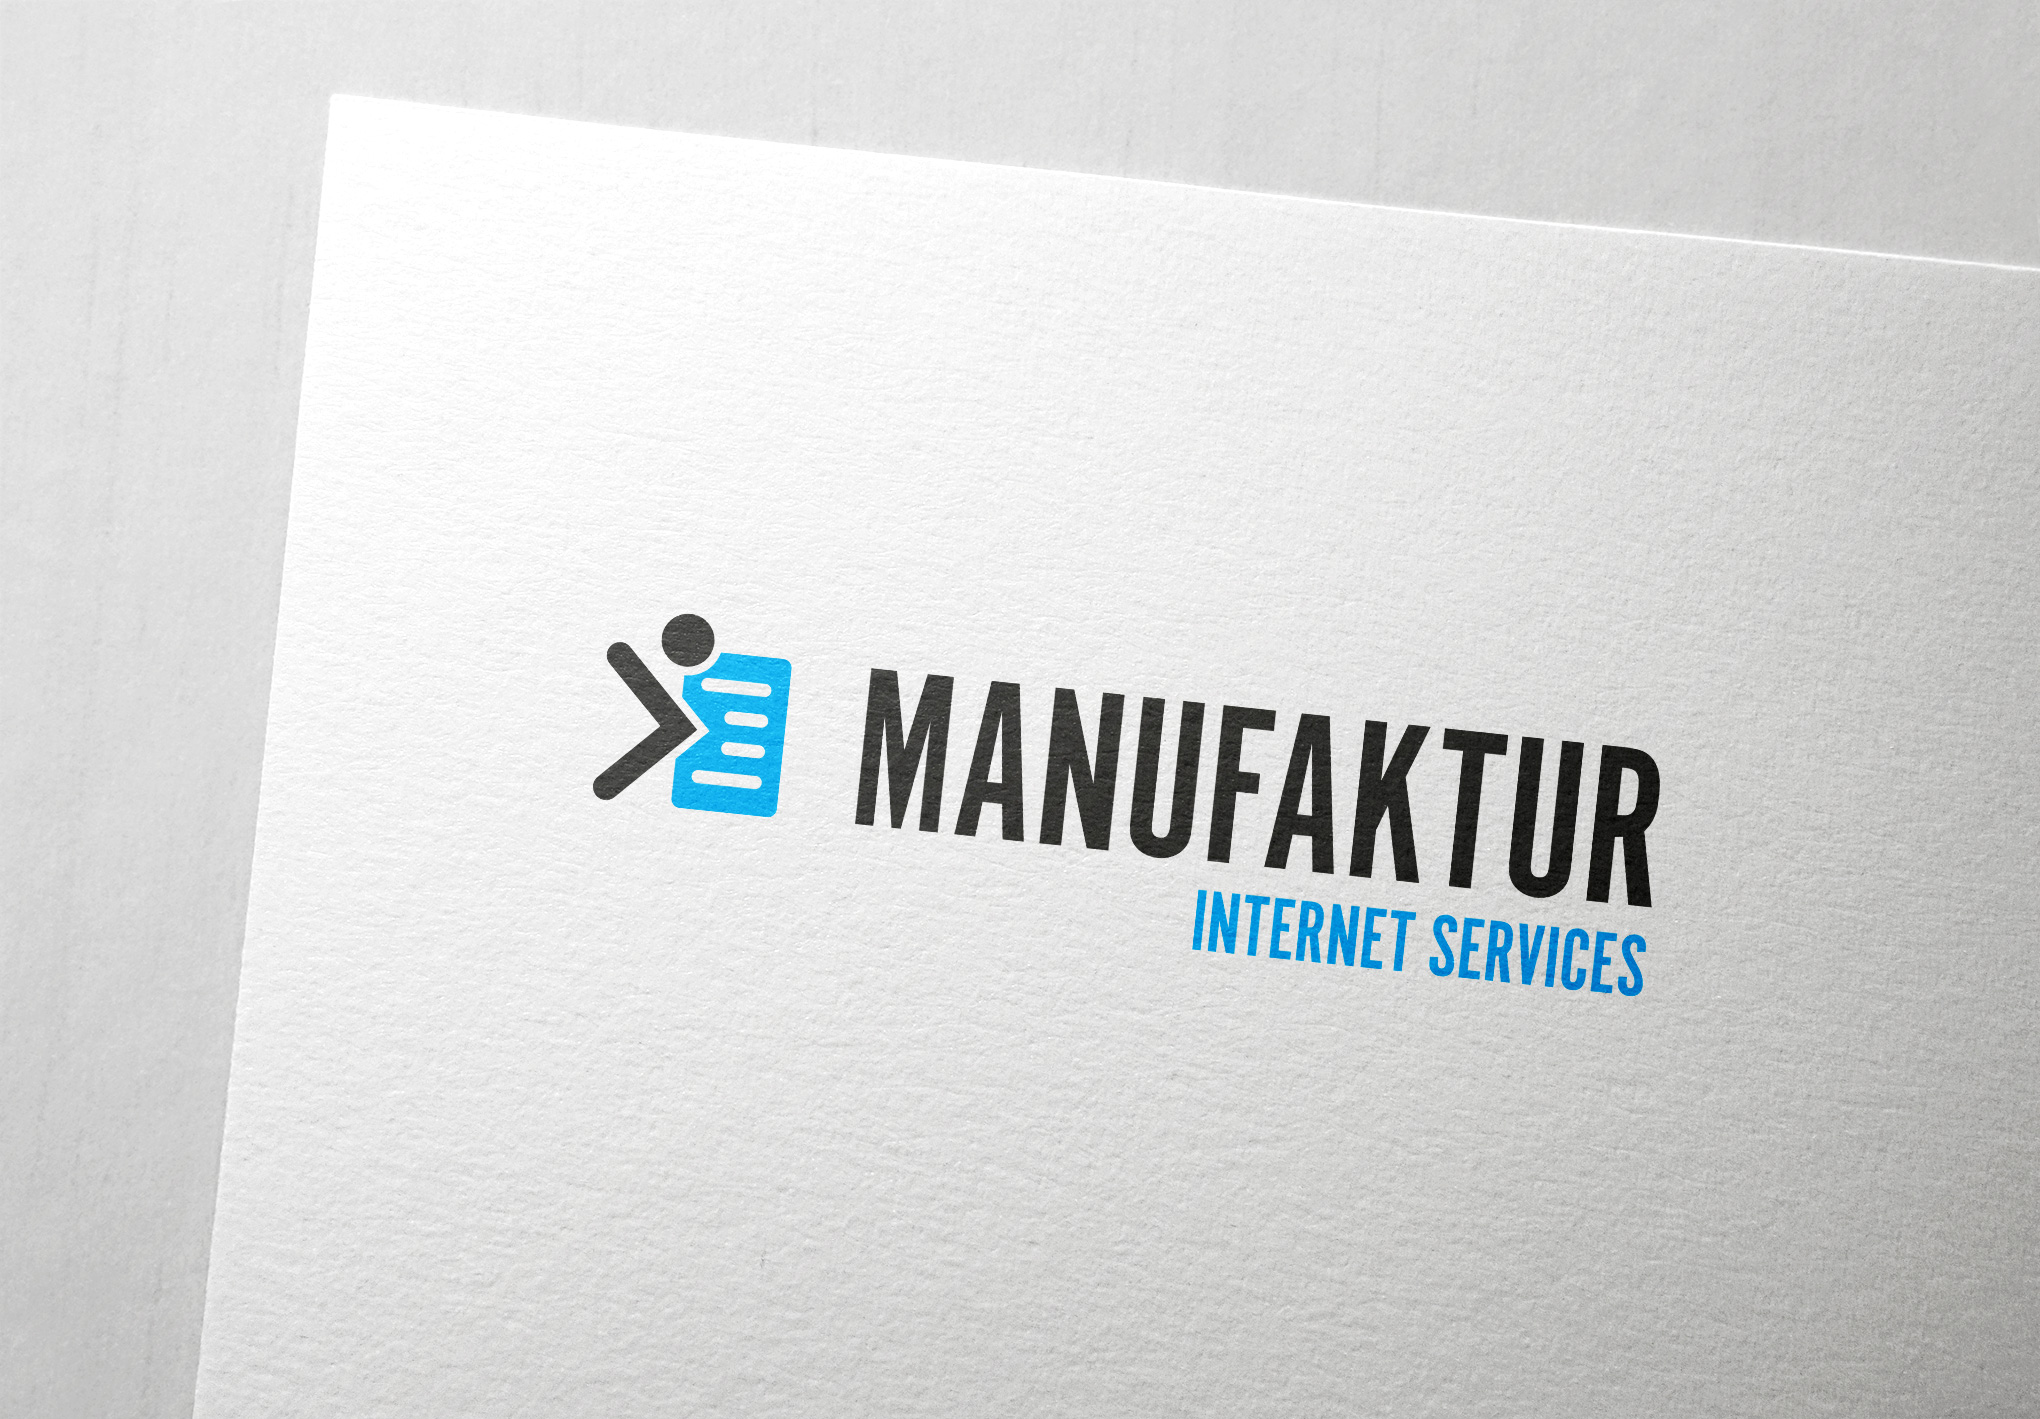 Logodesign für Manufaktur Internet Services